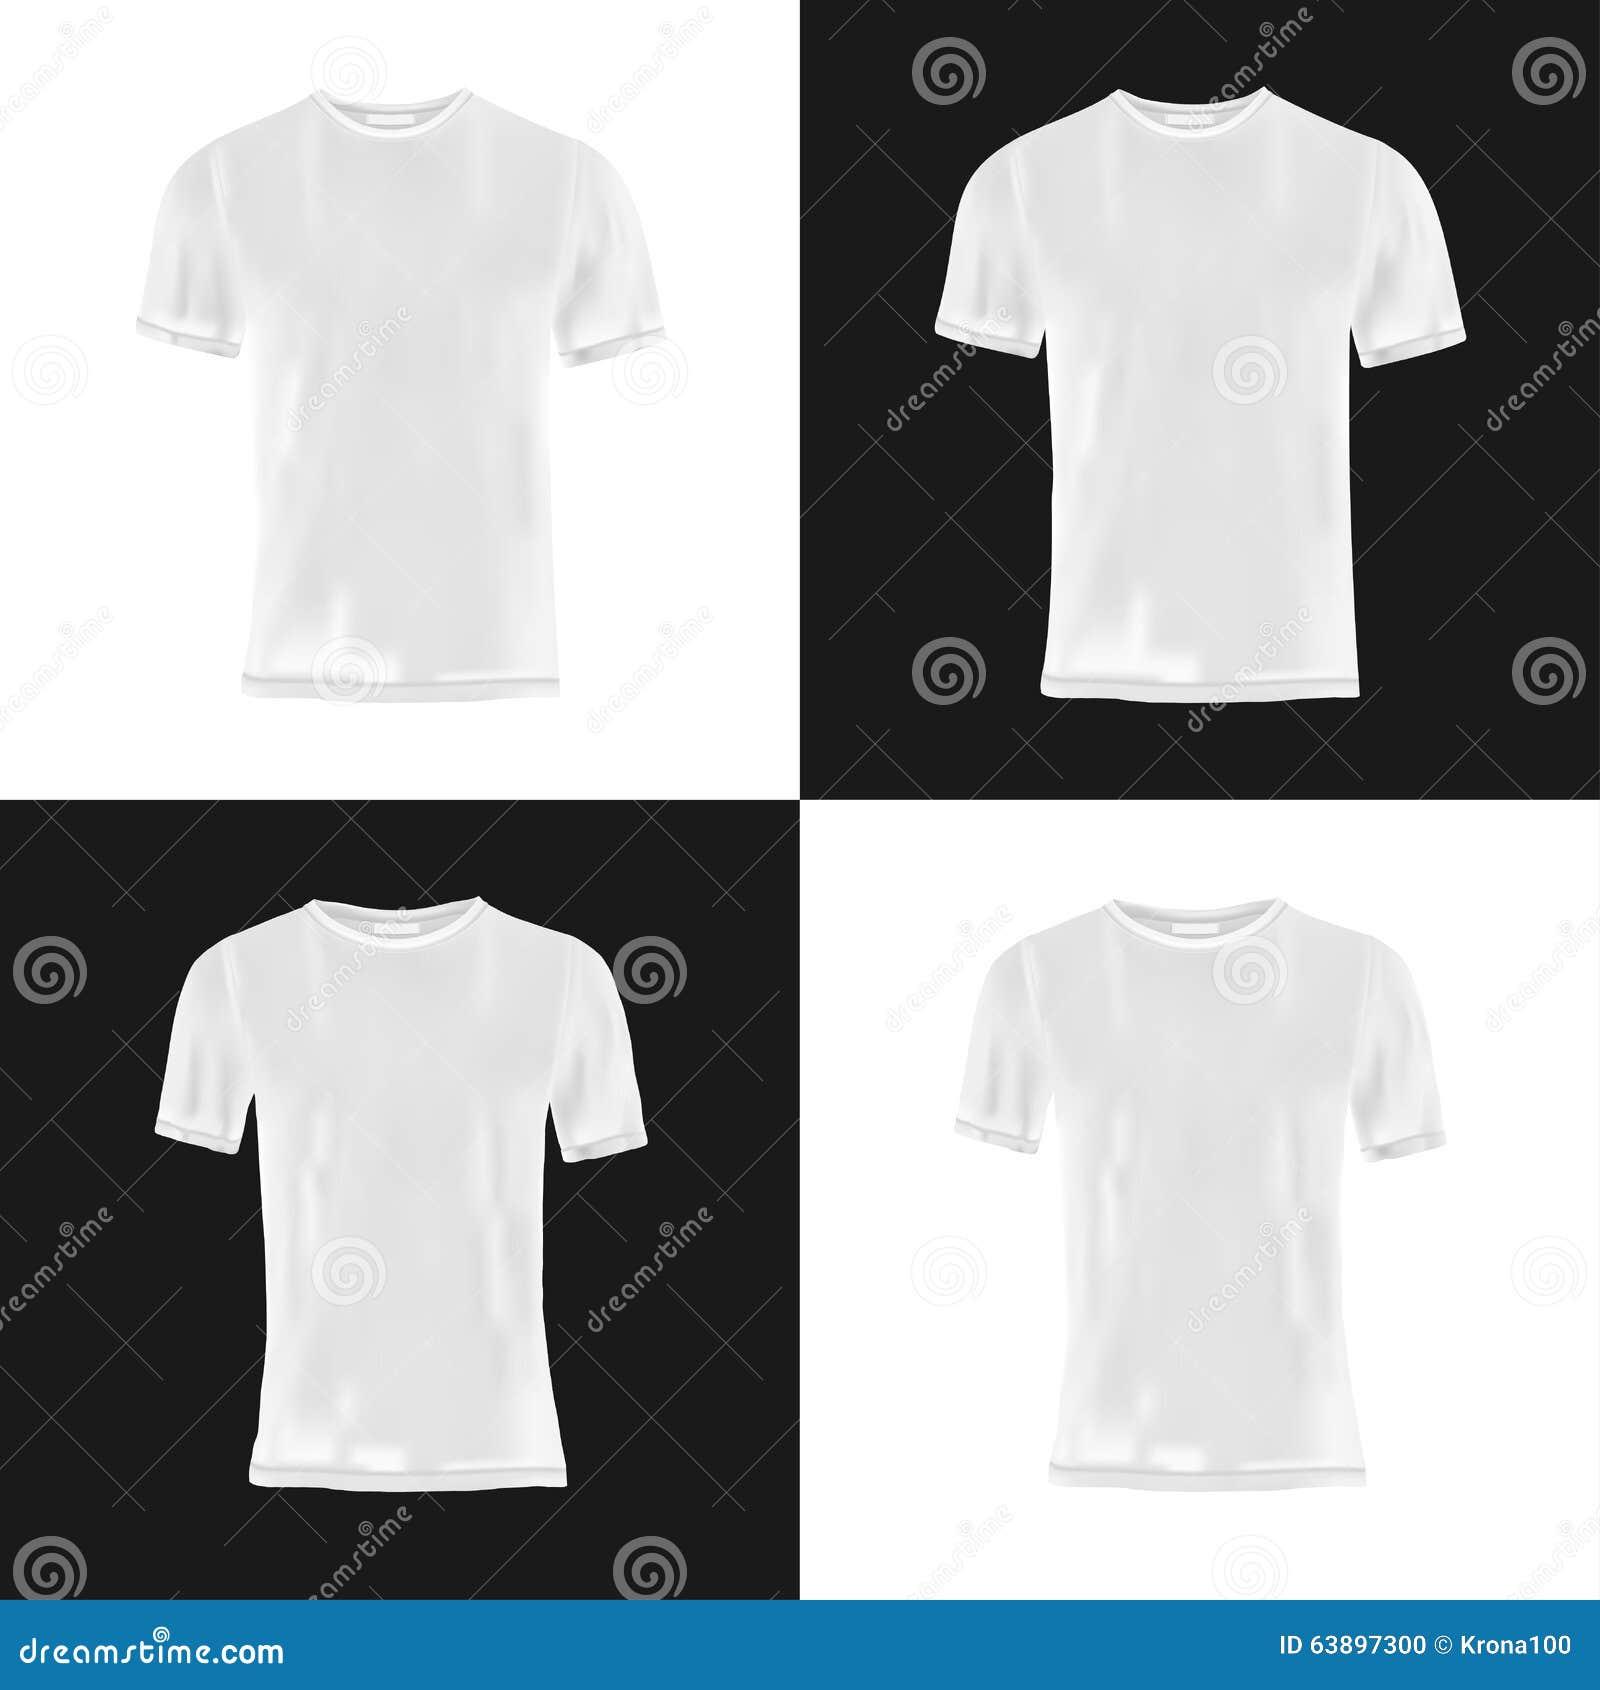 Shirt design black - Men S And Women S T Shirt Design Template Stock Photo